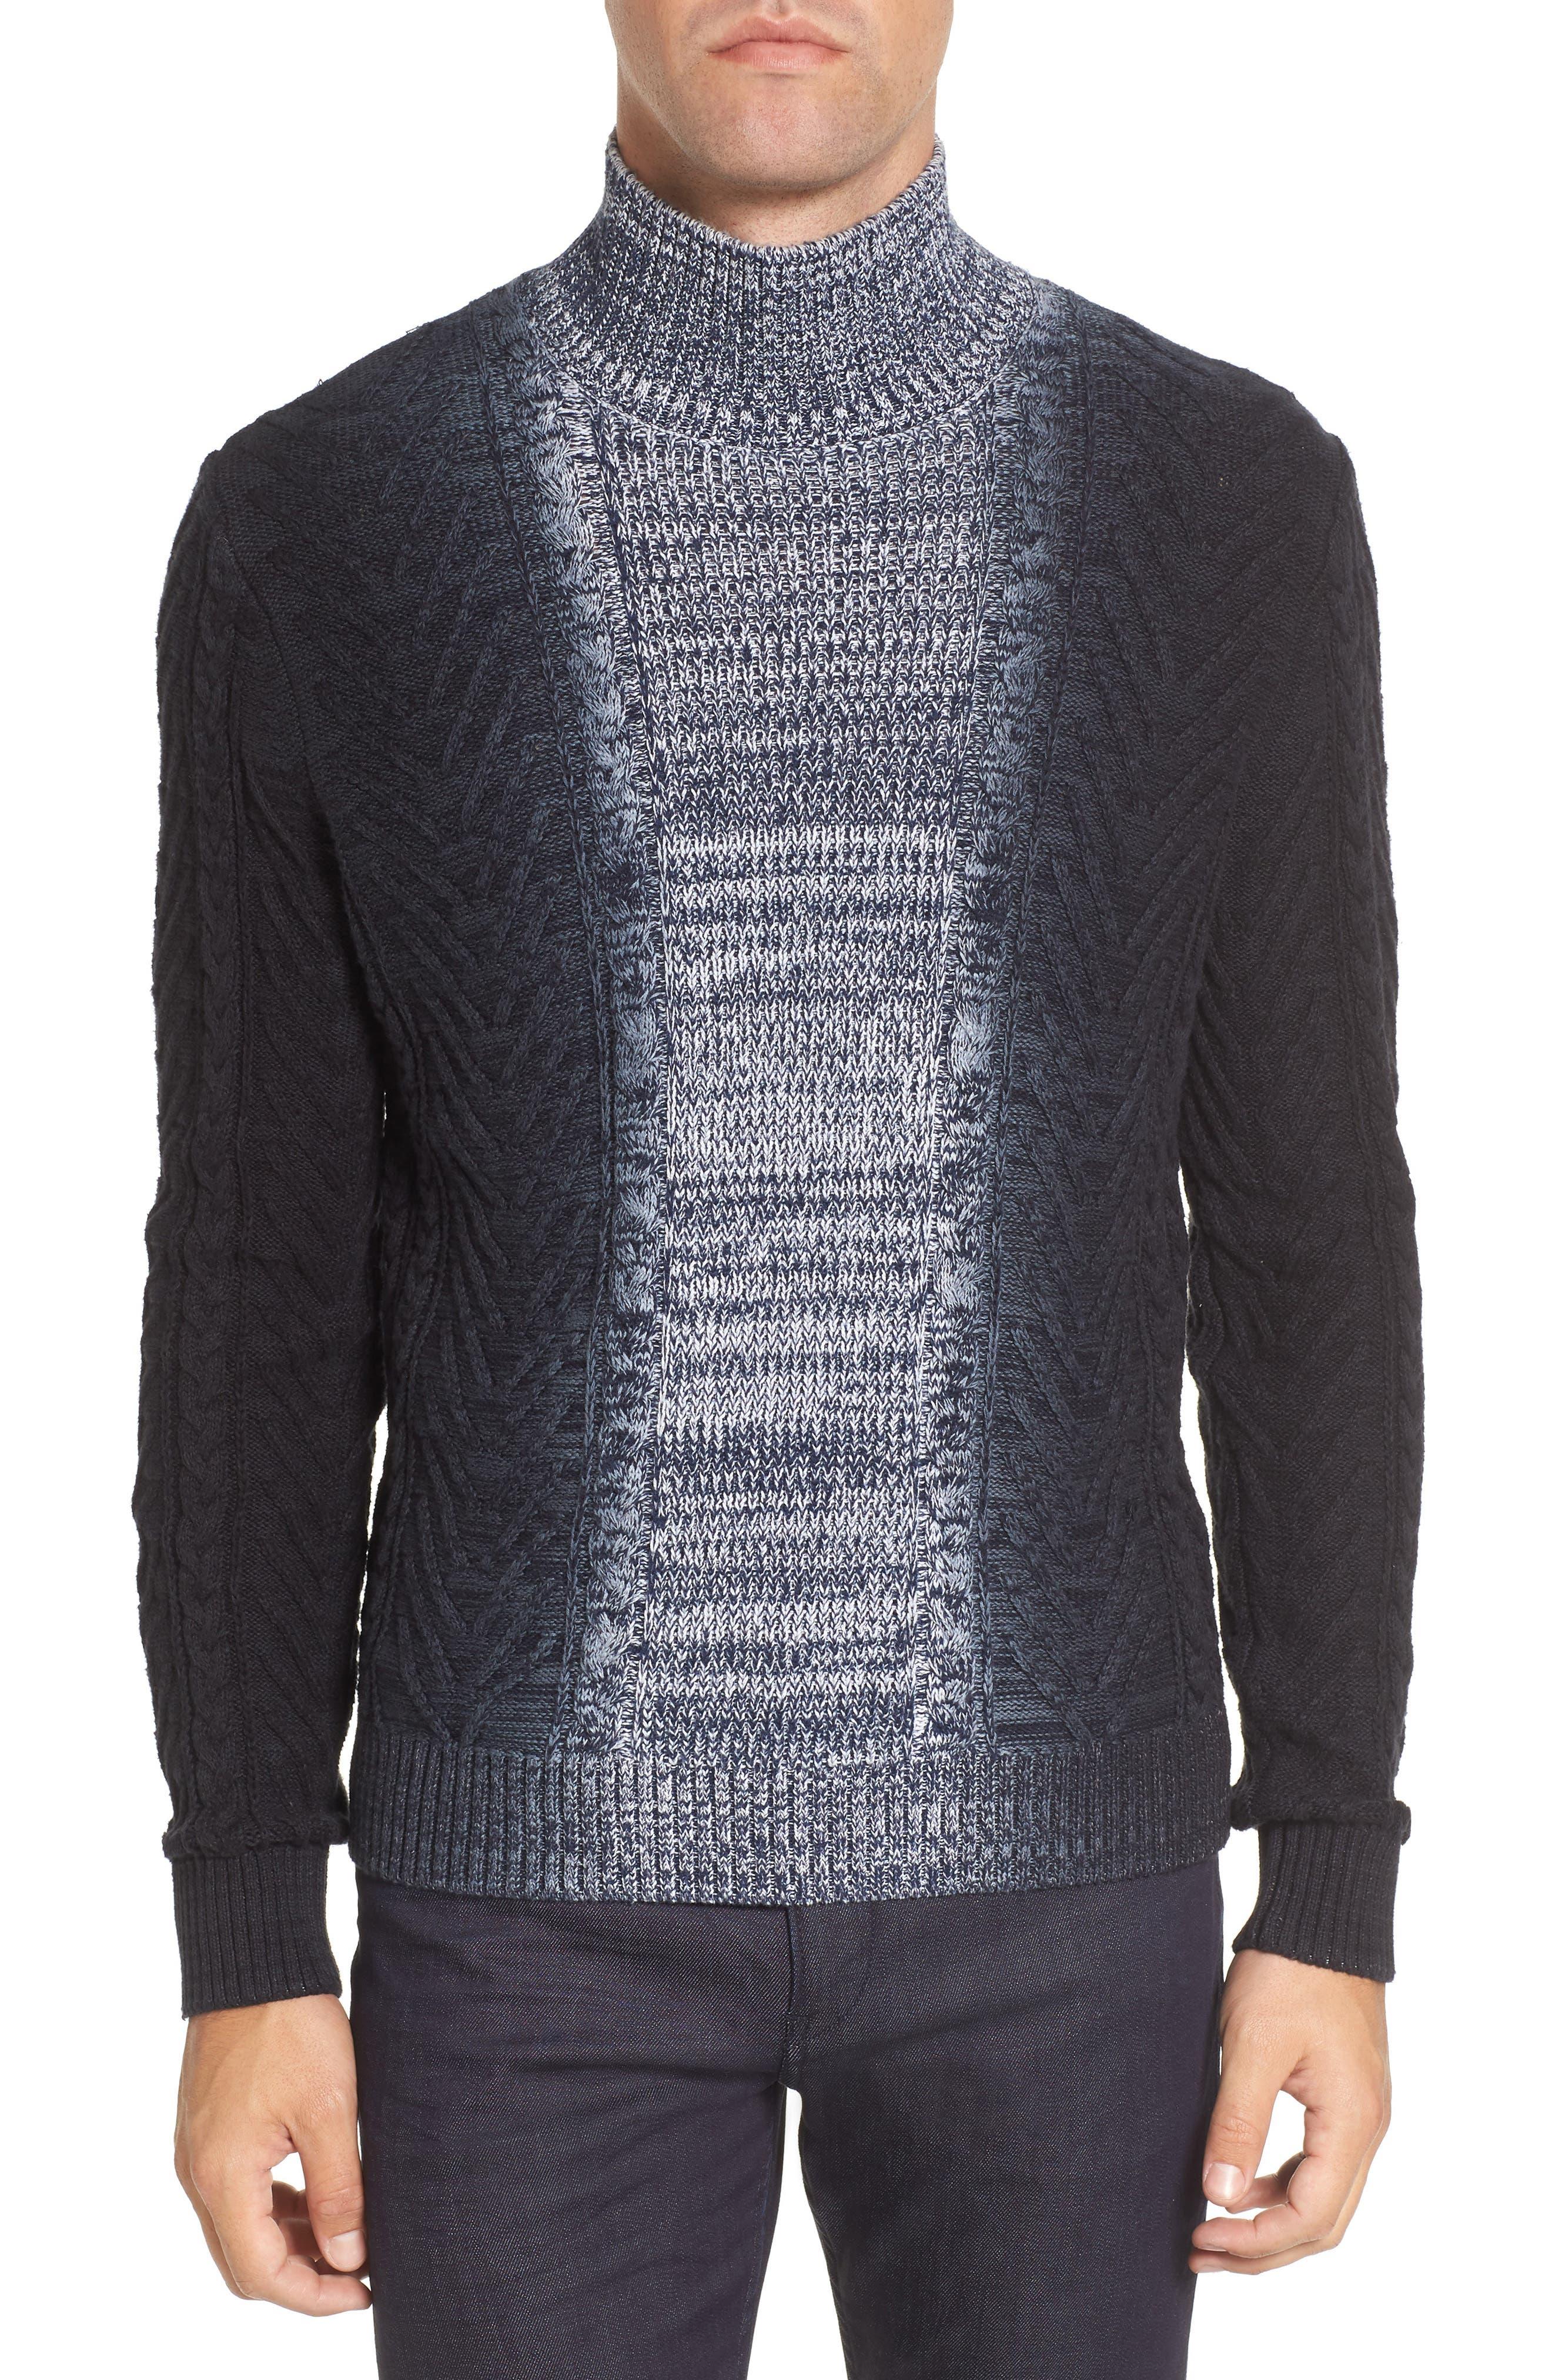 Alternate Image 1 Selected - Vince Camuto Gradient Fade Turtleneck Sweater